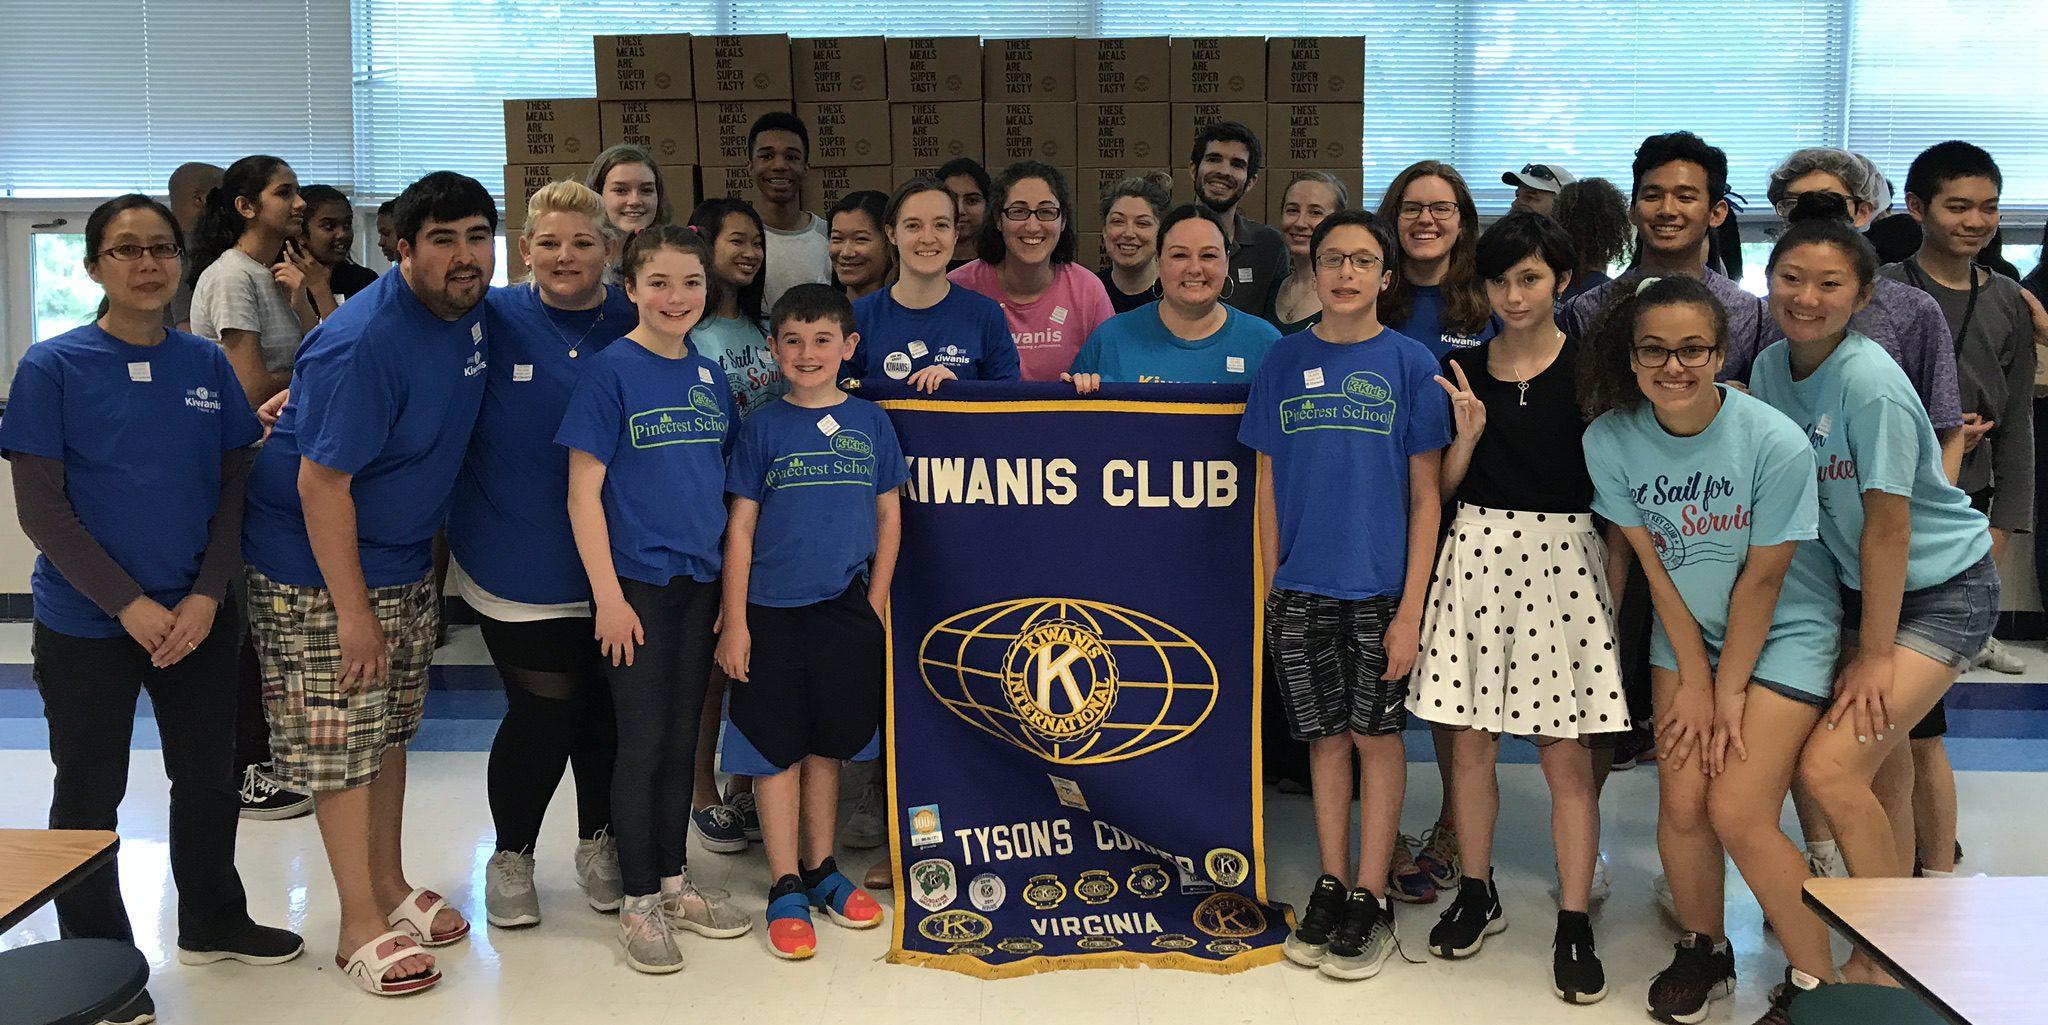 Kiwanis Club of Tysons, VA